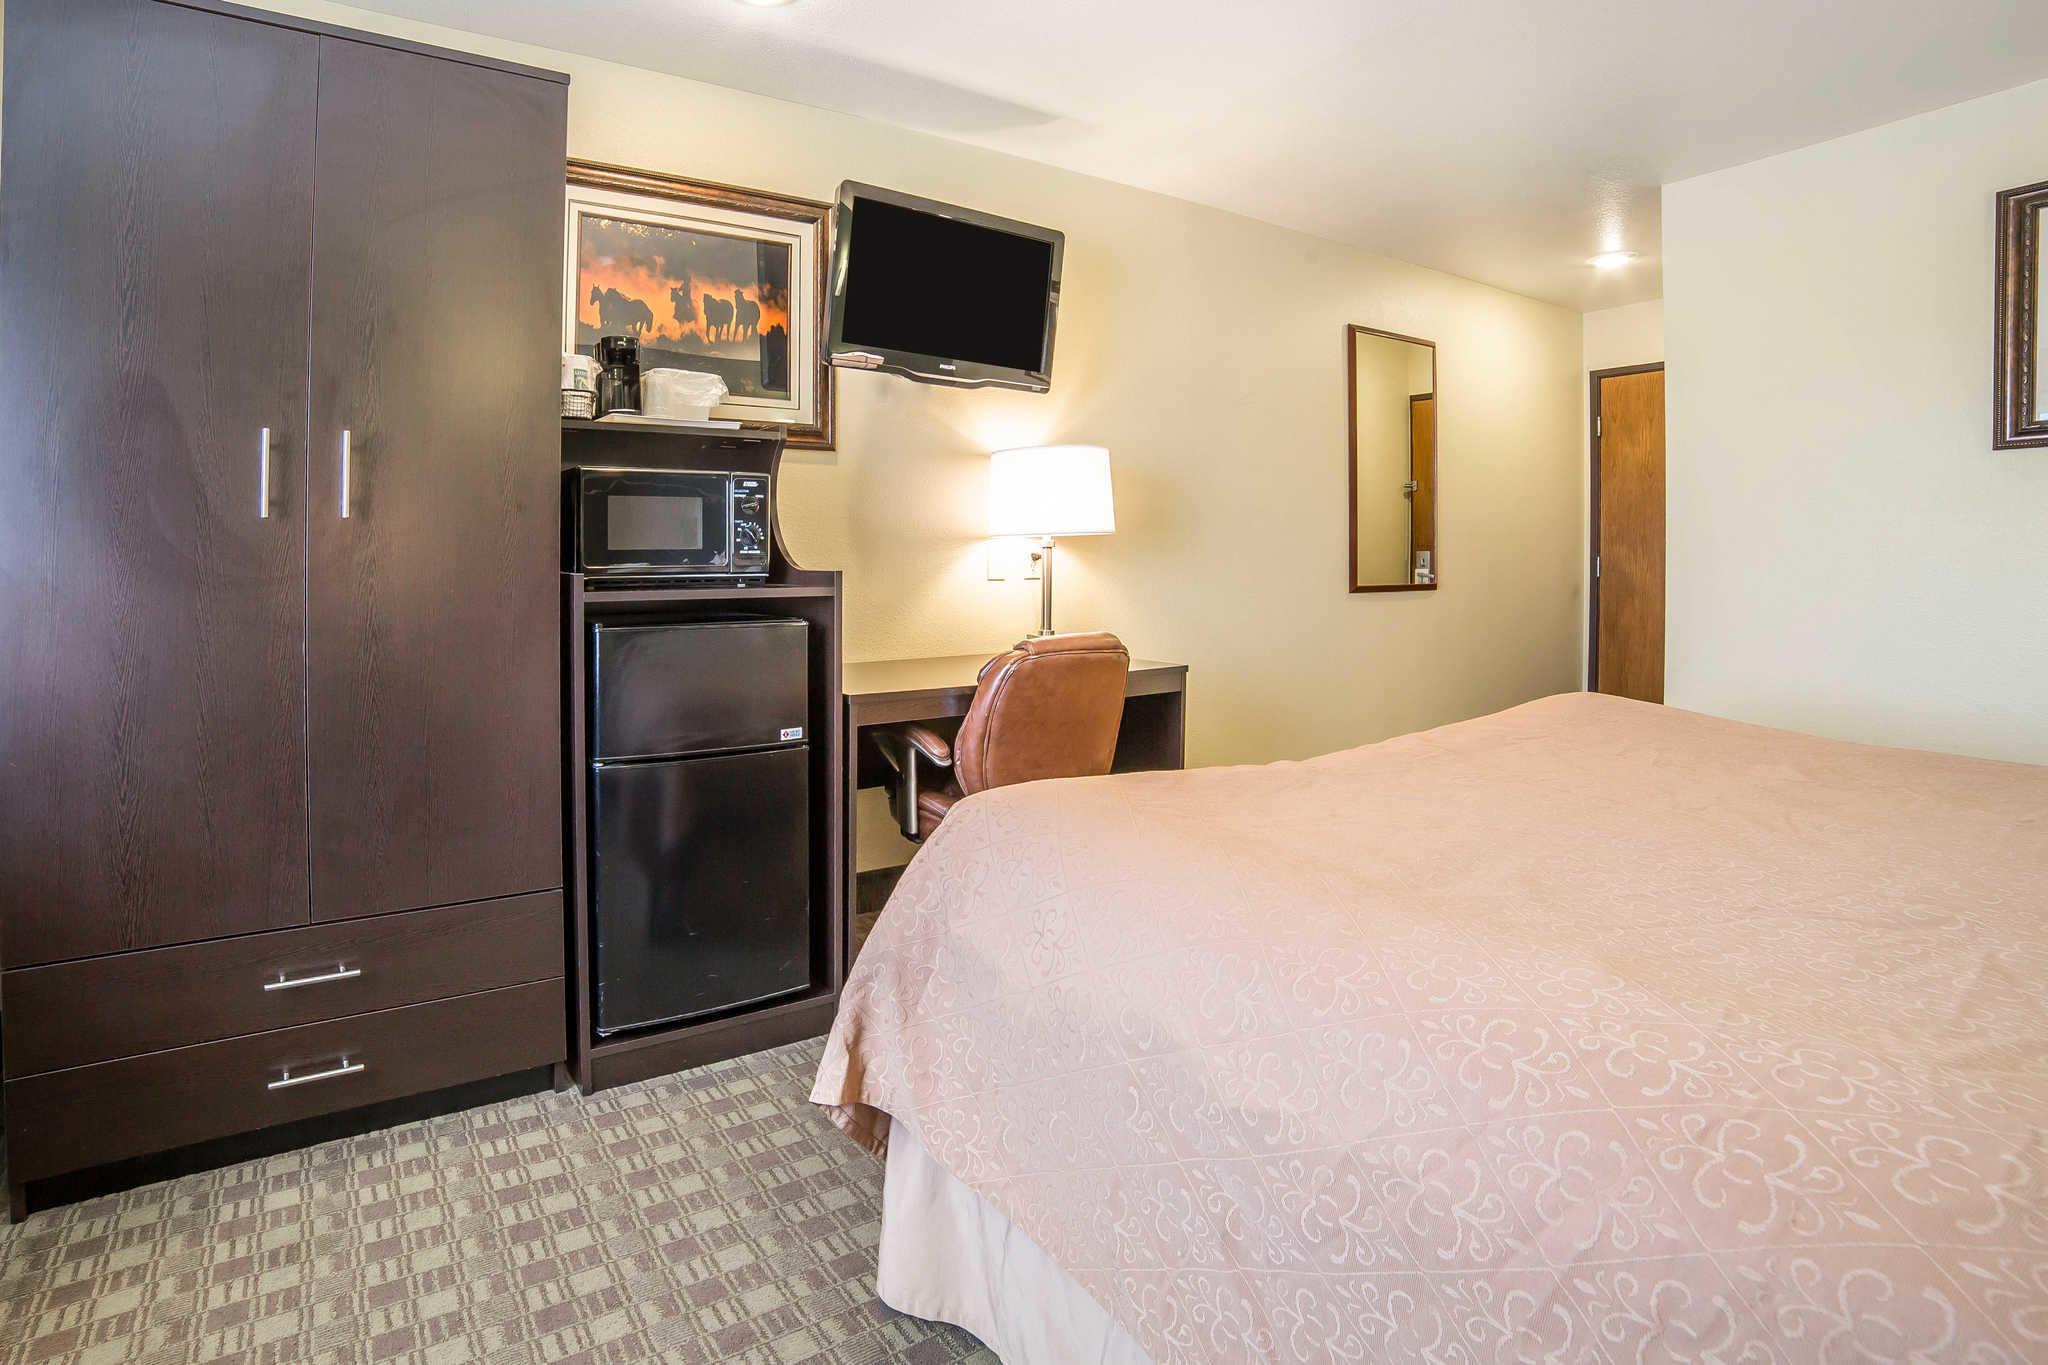 Quality Inn & Suites Elko image 8